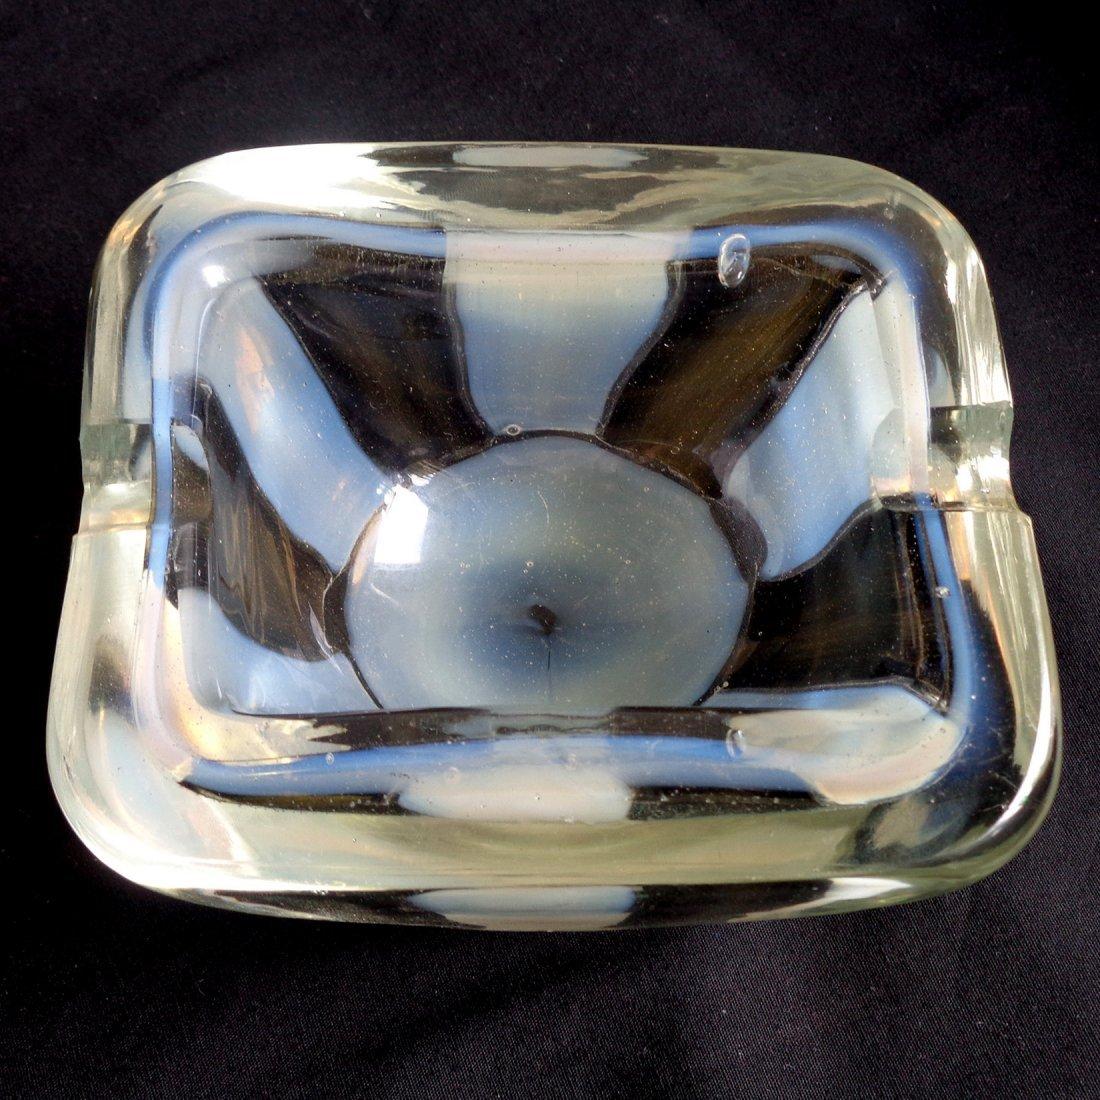 Barovier Toso Murano Opal Pezzato Art Glass Ashtray - 4